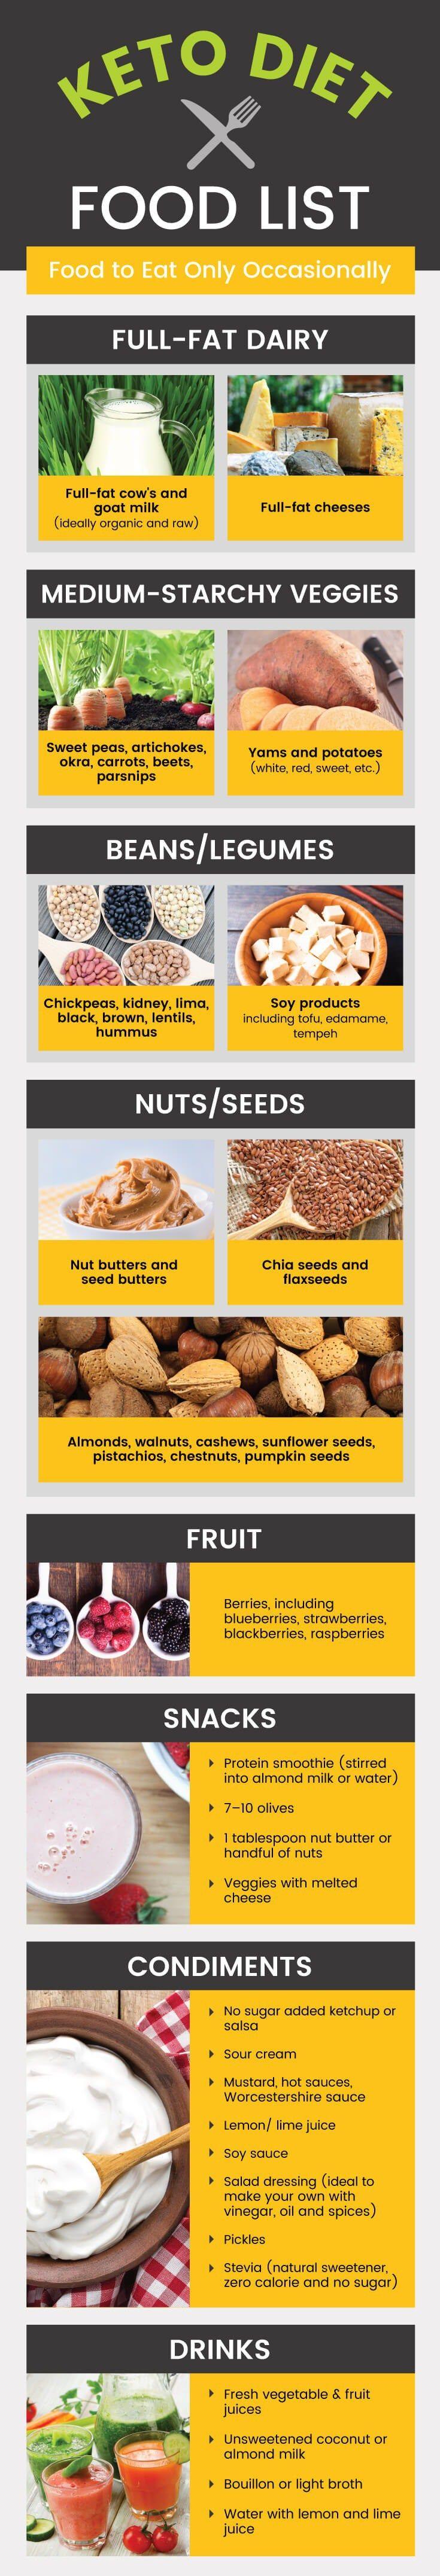 Keto Diet Food List Including The Best Vs Worst Keto Foods Health Food Is Medicine Keto Diet Food List Diet Food List Low Carb Food List